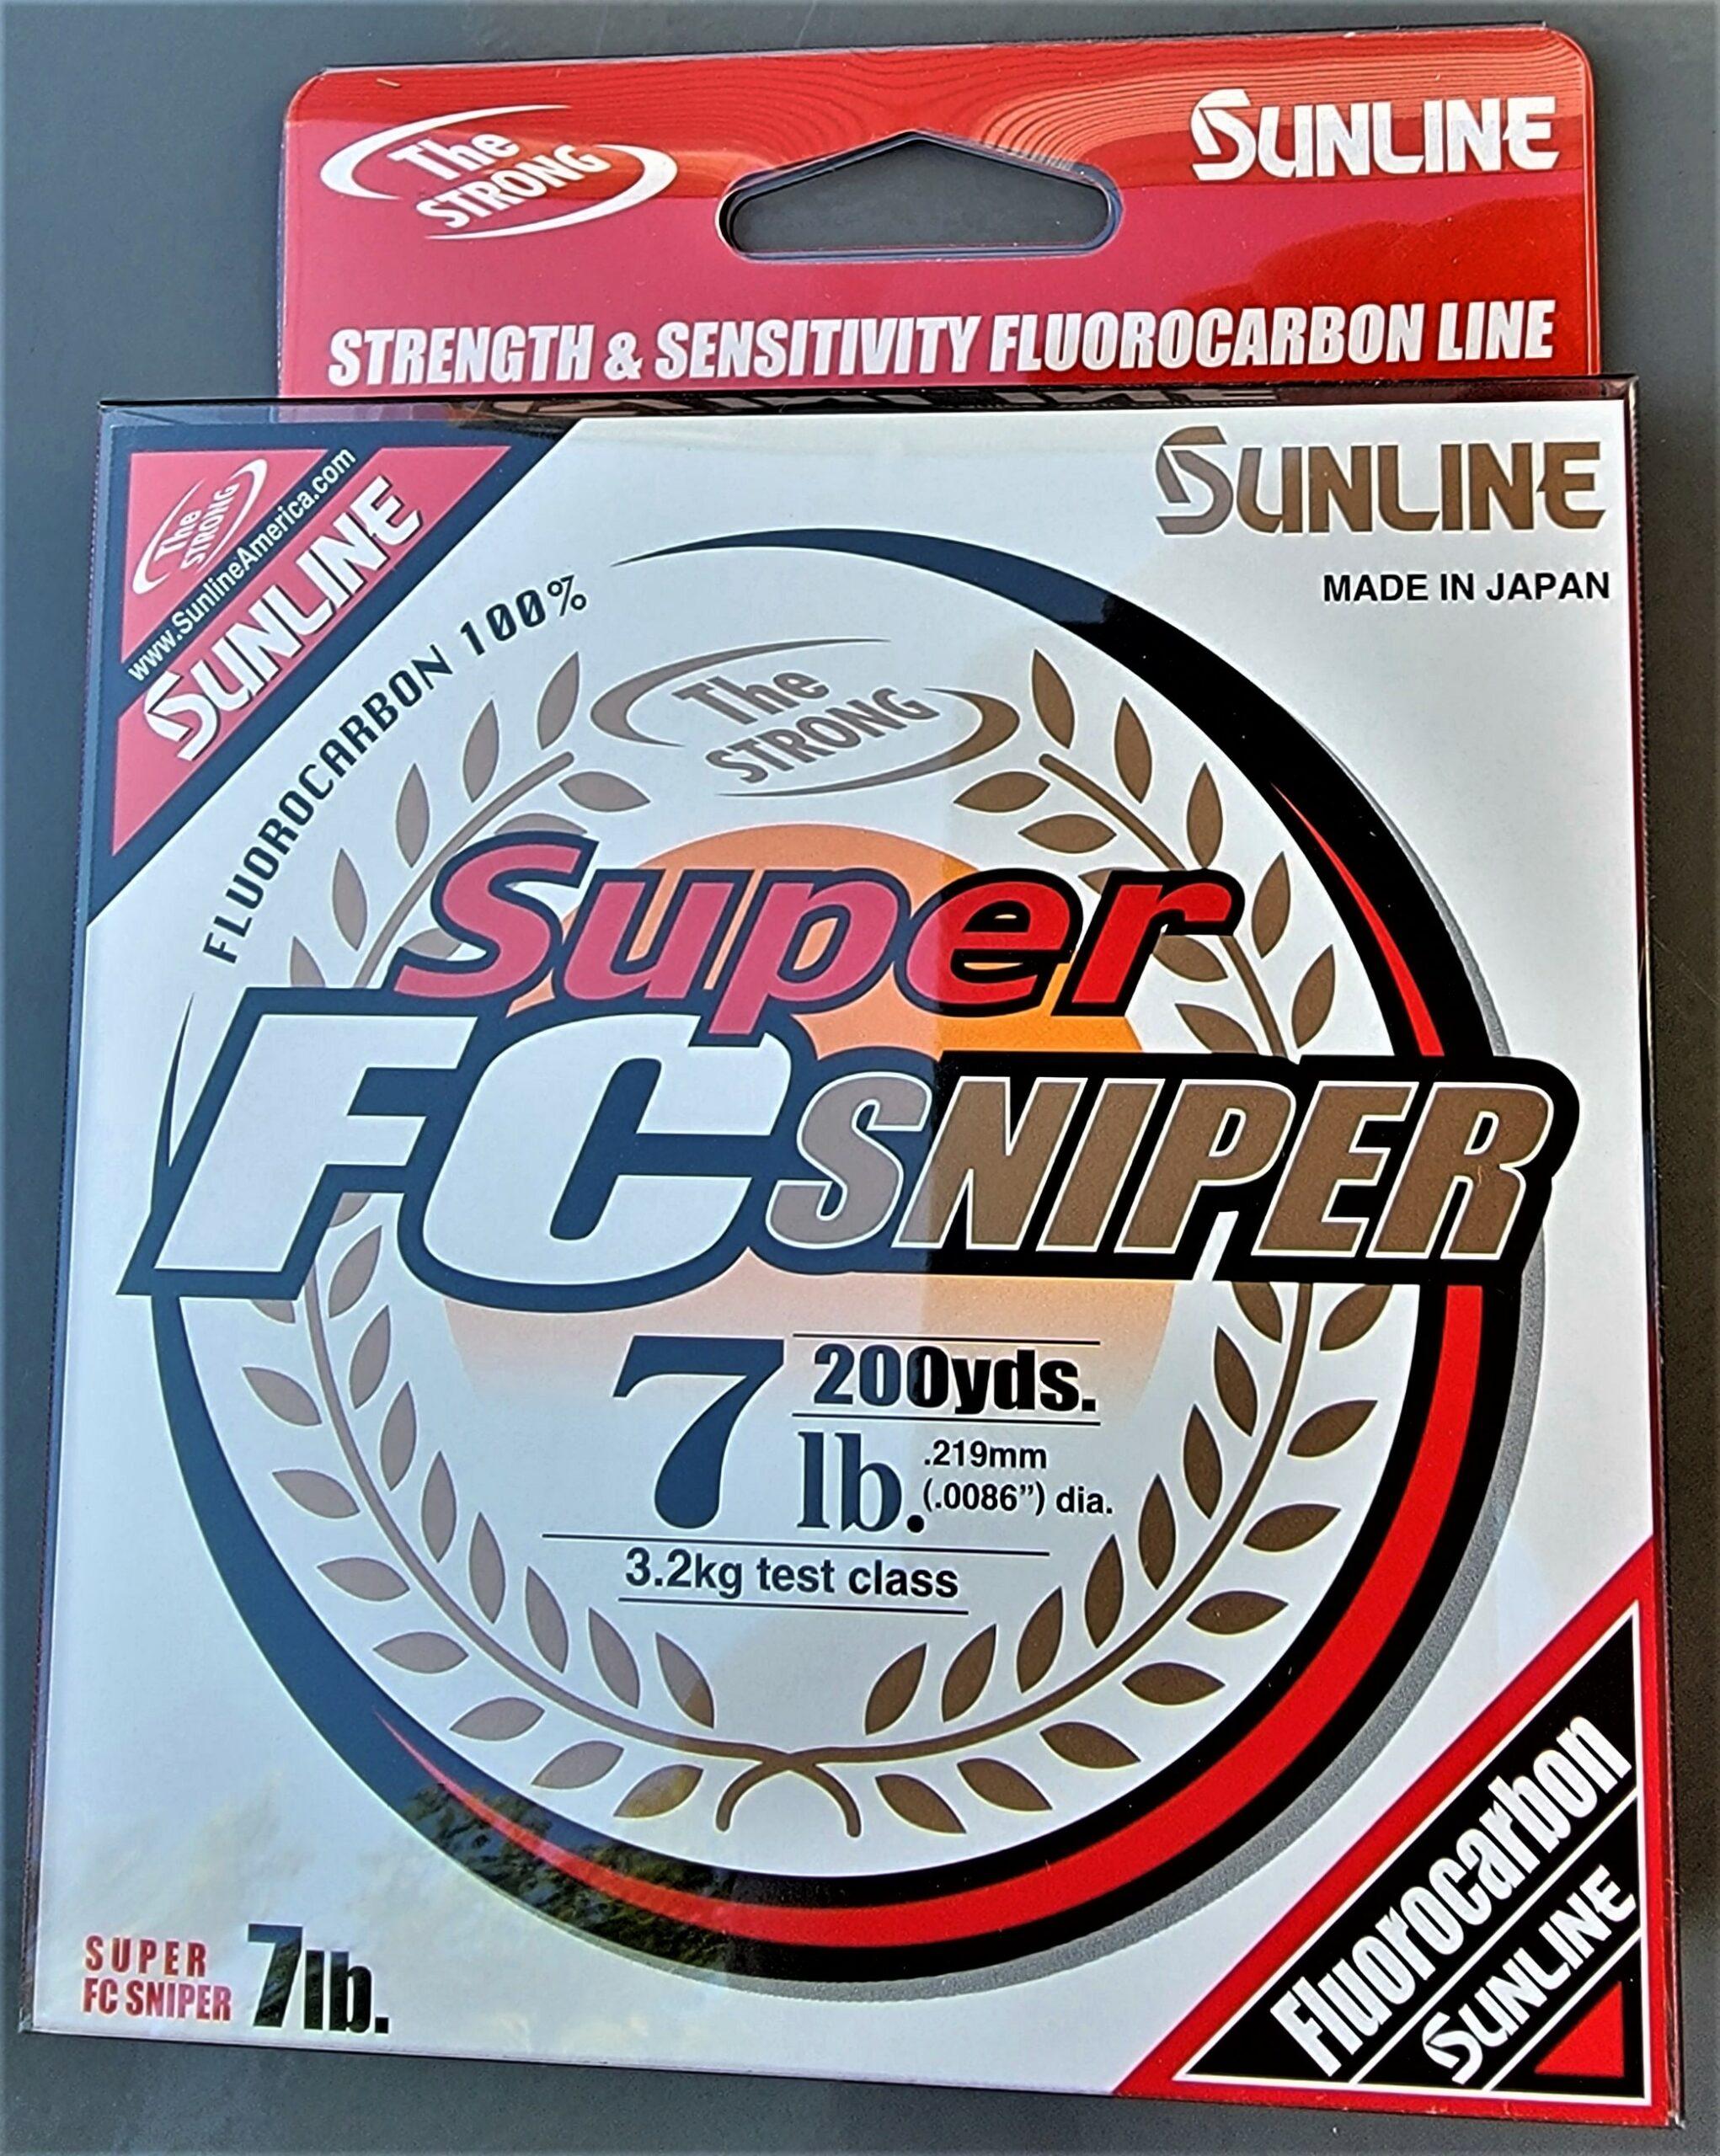 Sunline - Super FC Sniper - 200 YD - Super FC Sniper - 7 LB - Natural Clear